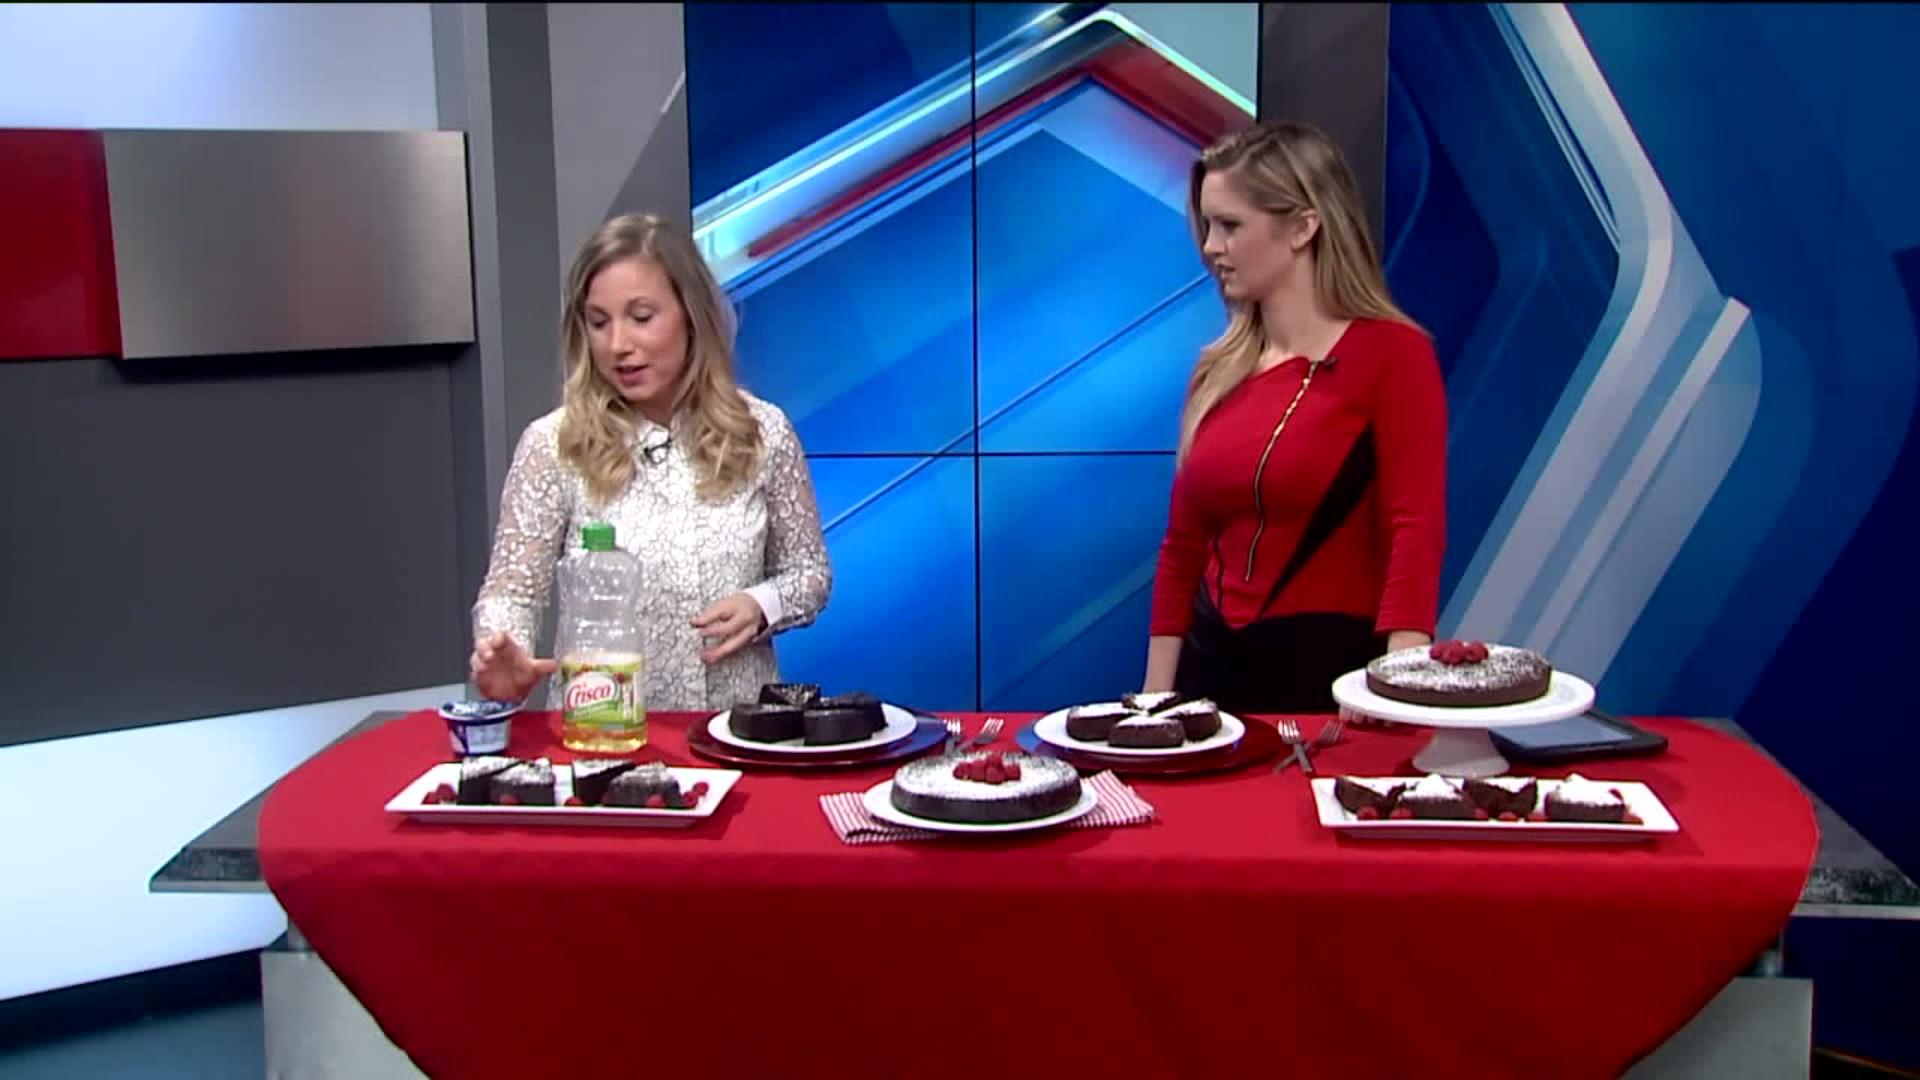 How to Make Guilt-Free Chocolate Cake